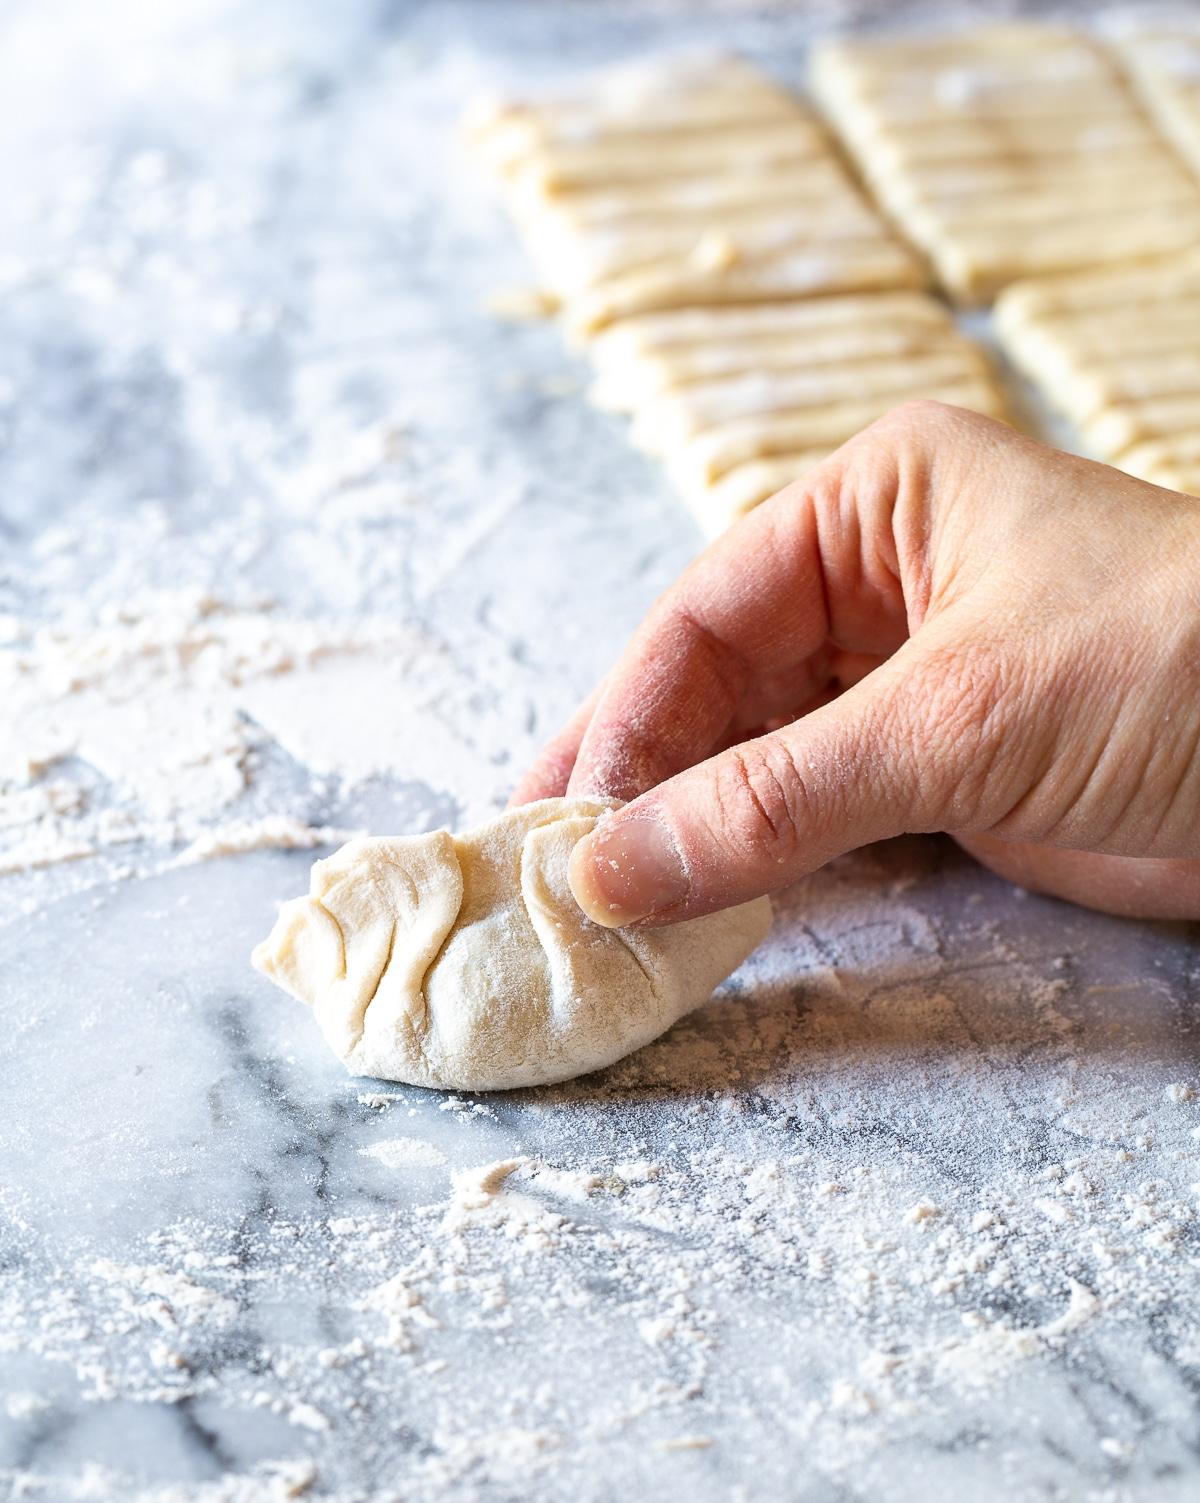 Chinese Potsticker Recipe #potstickers #dumplings #chinese #appetizer #dimsum